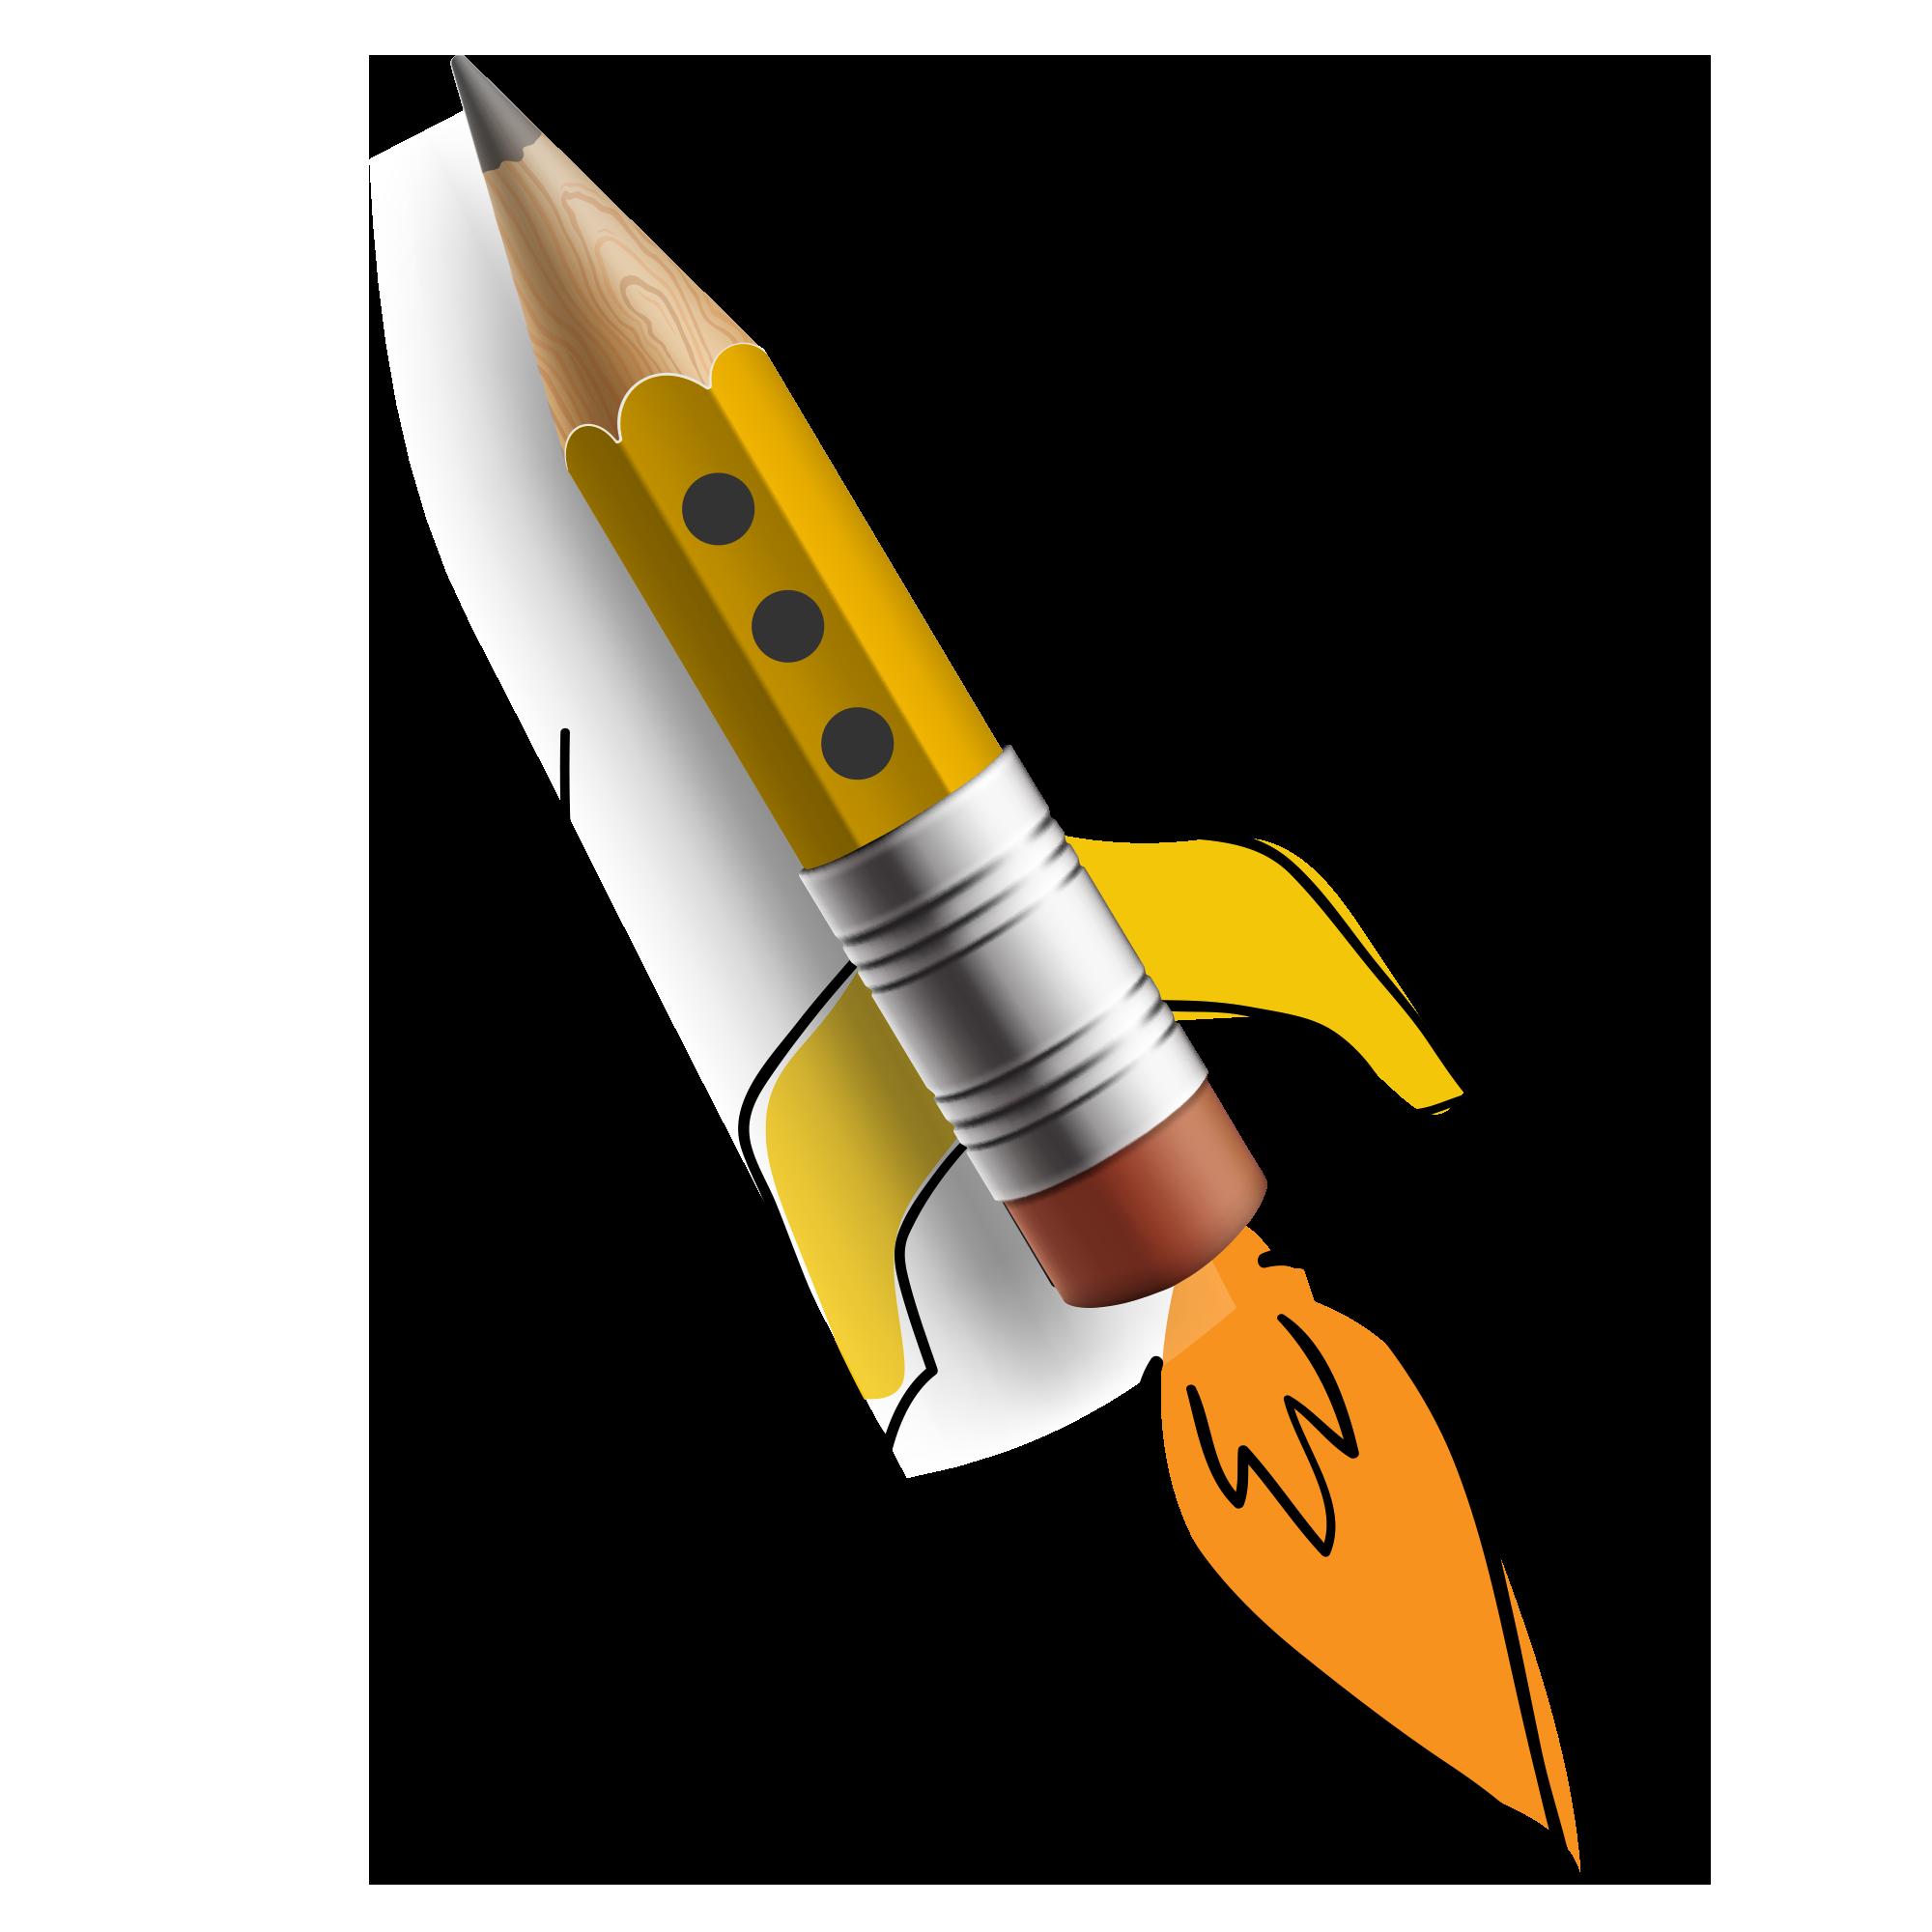 https://e-serial.fr/wp-content/uploads/2020/08/audit_crayon.png